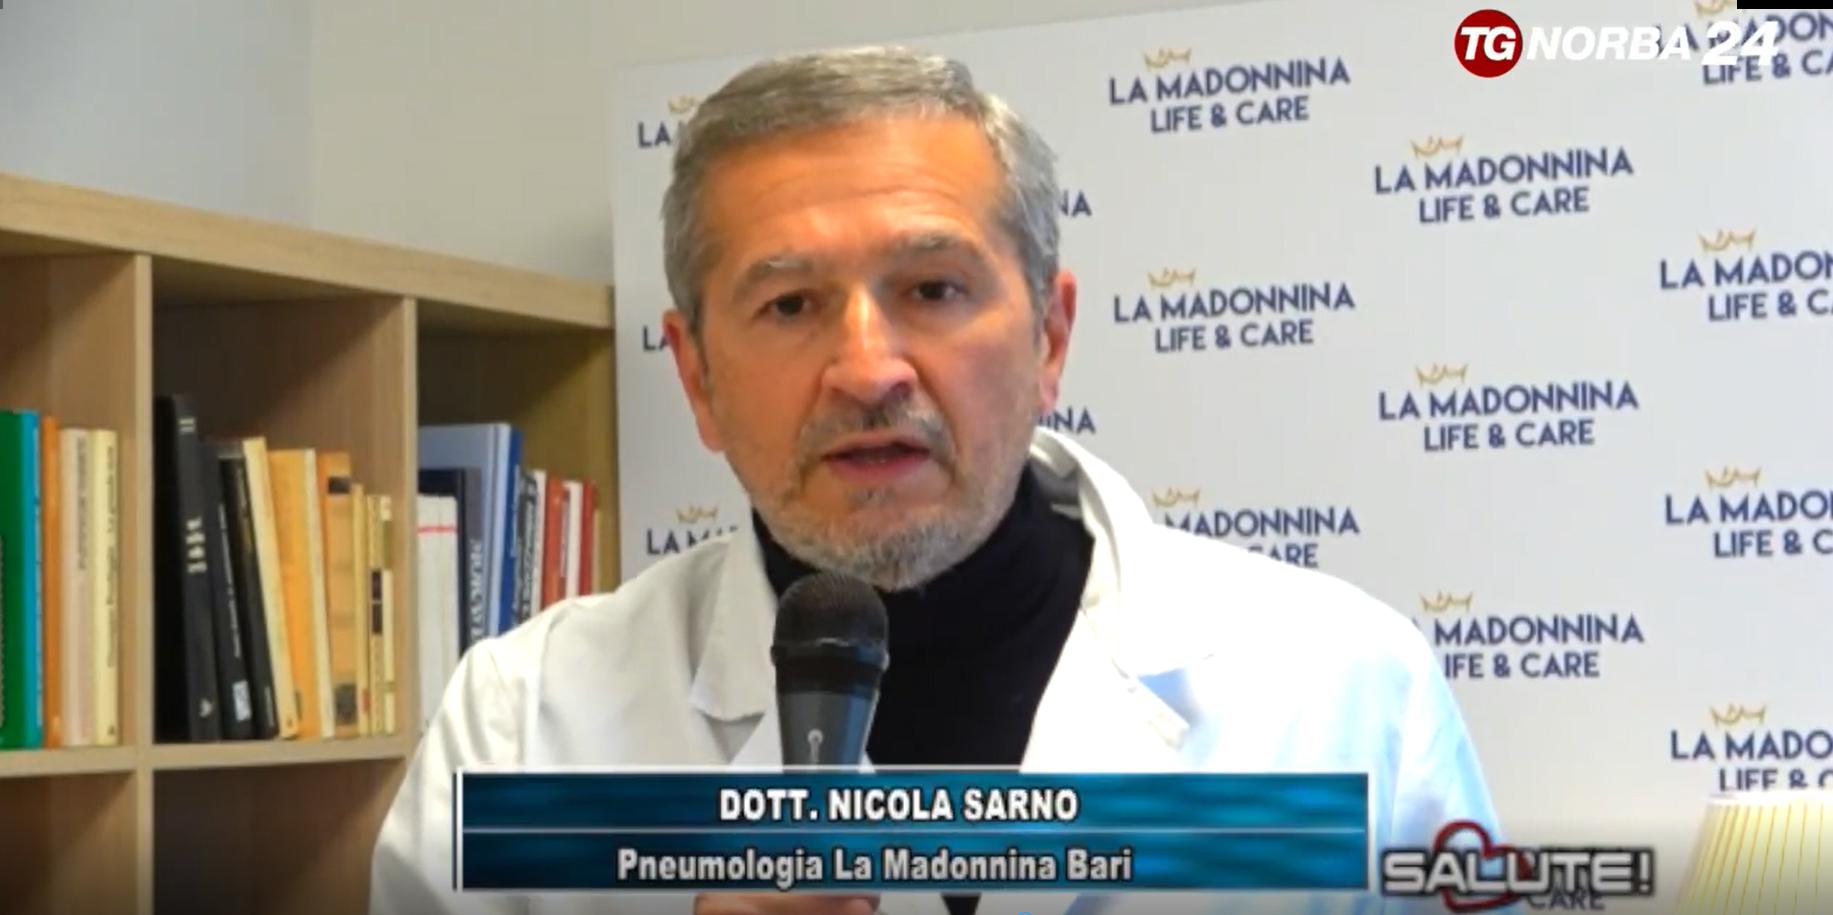 Dott. Nicola Sarno 2